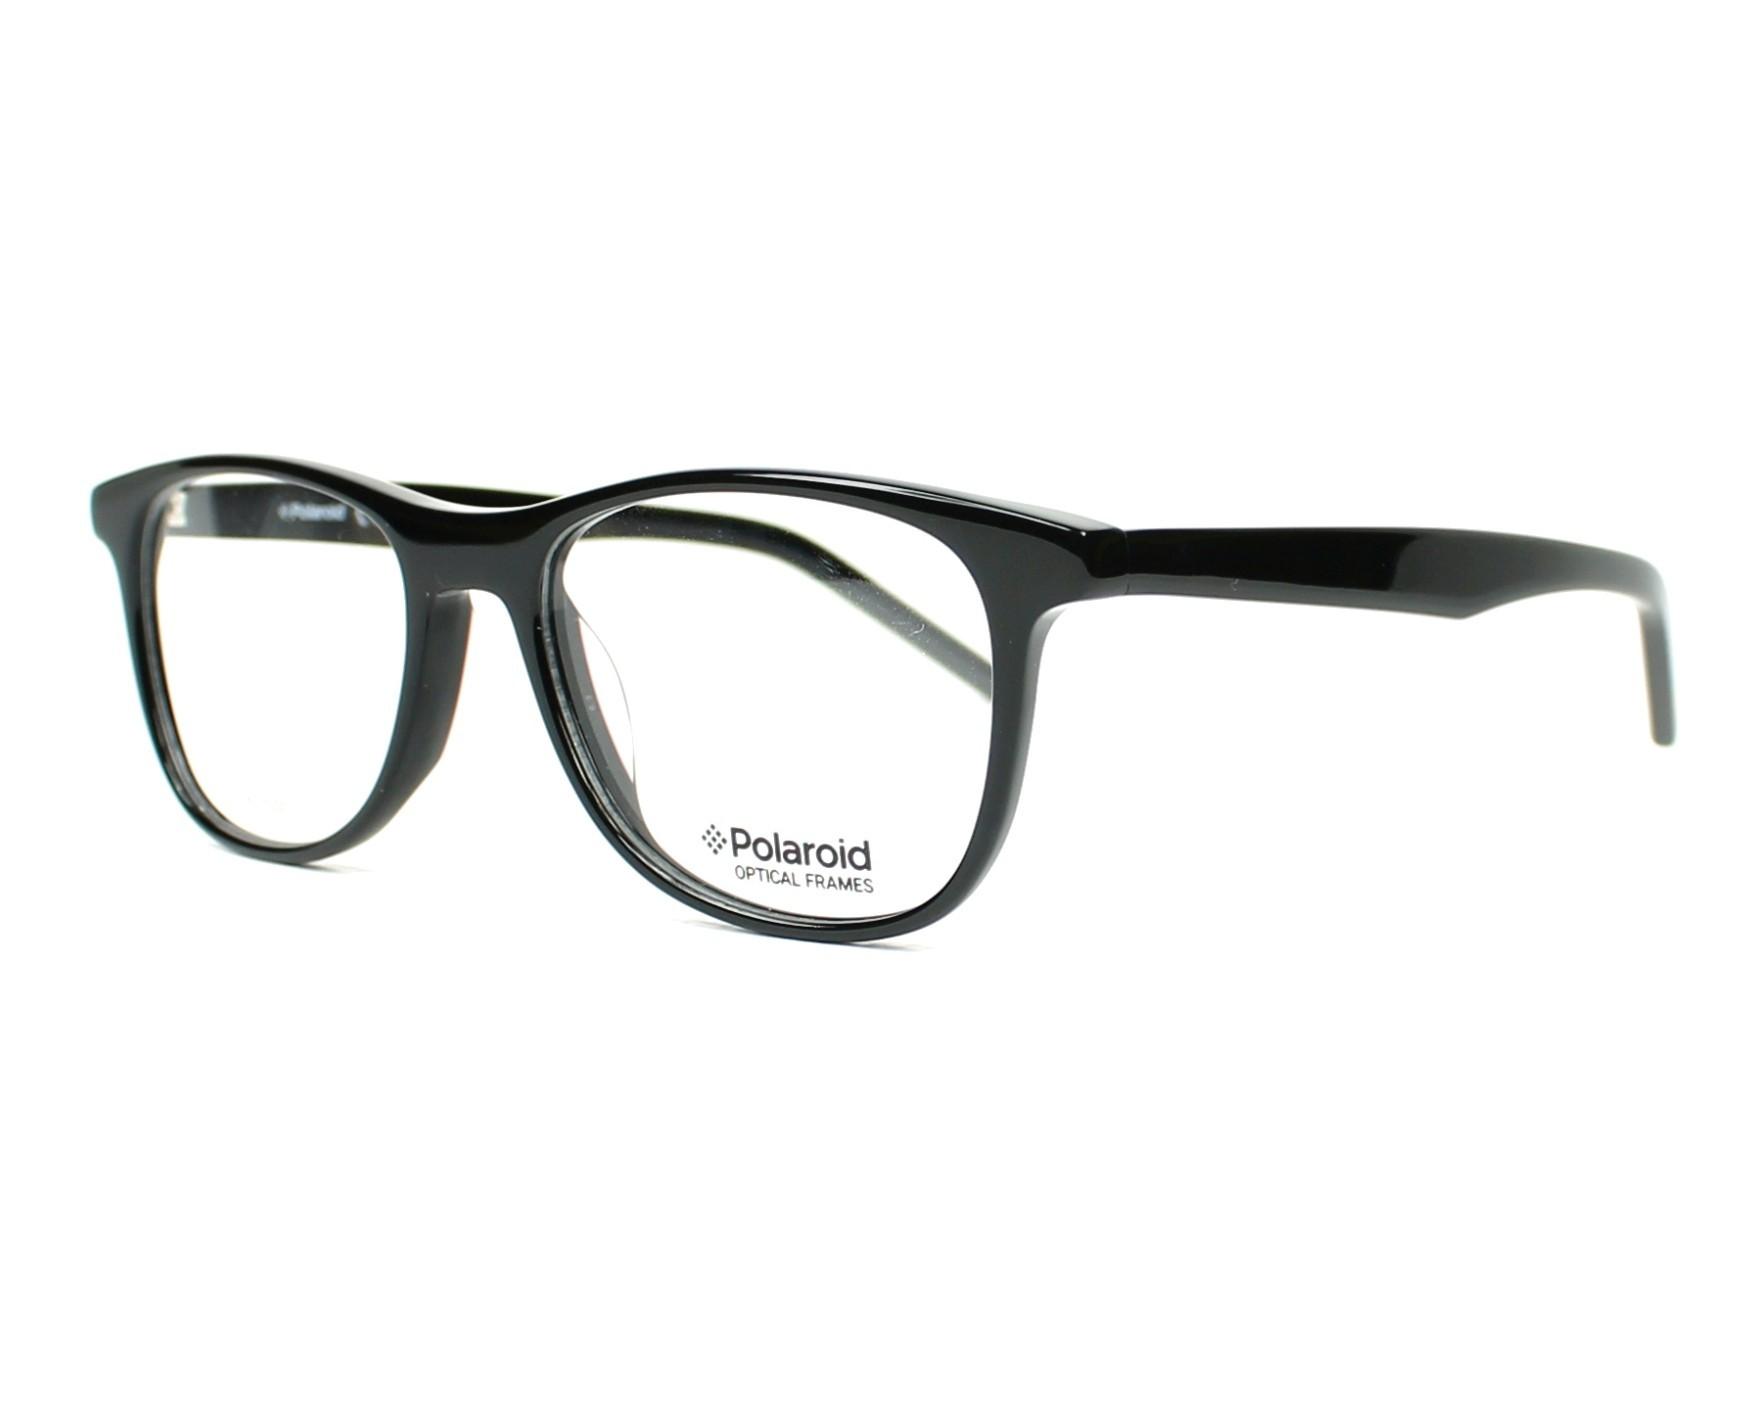 c6dddcc5e7a5 eyeglasses Polaroid PLDD-801 807 47-16 Black profile view